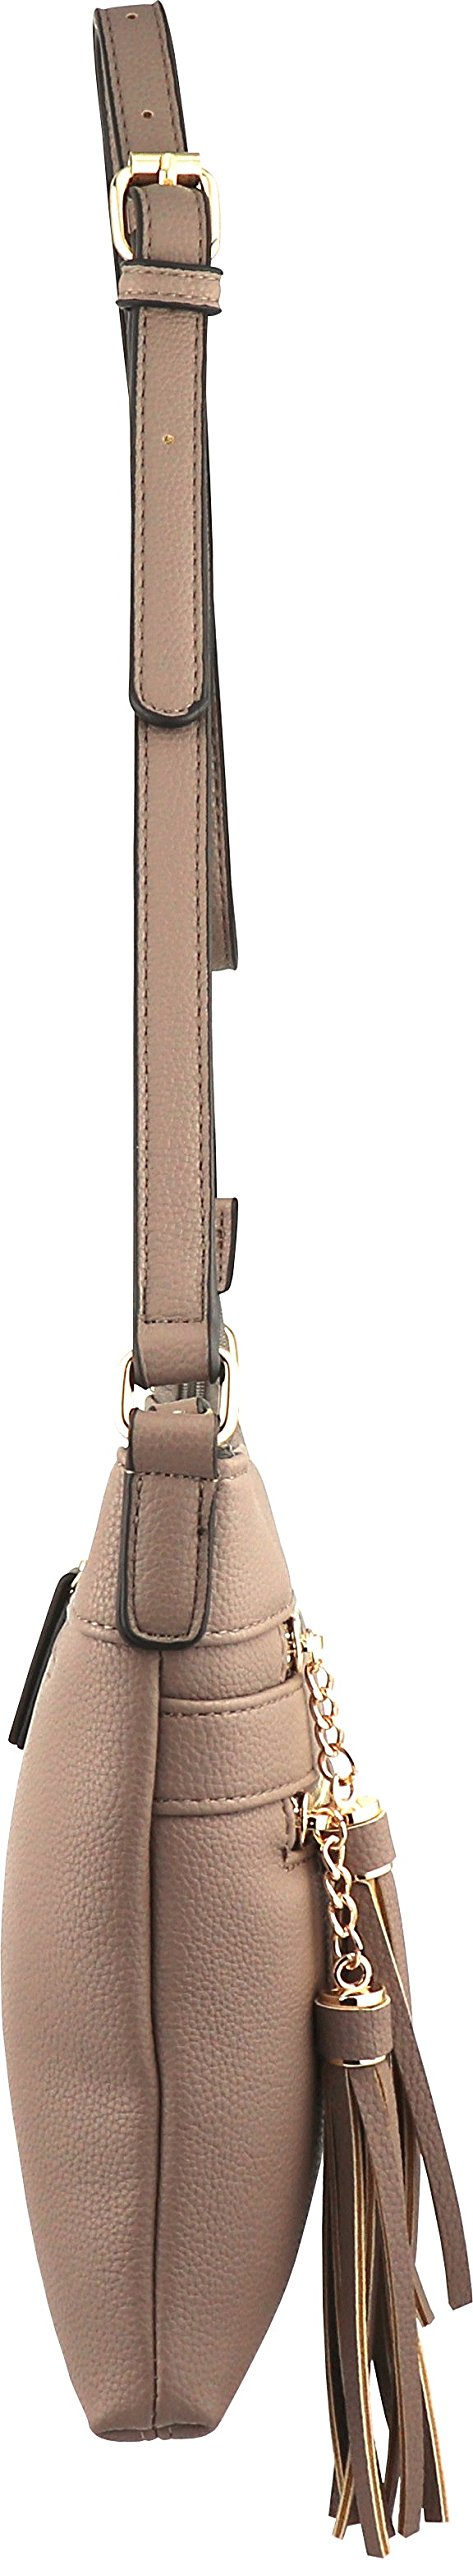 B BRENTANO Vegan Multi-Zipper Crossbody Handbag Purse with Tassel Accents (Nude 1) by B BRENTANO (Image #4)